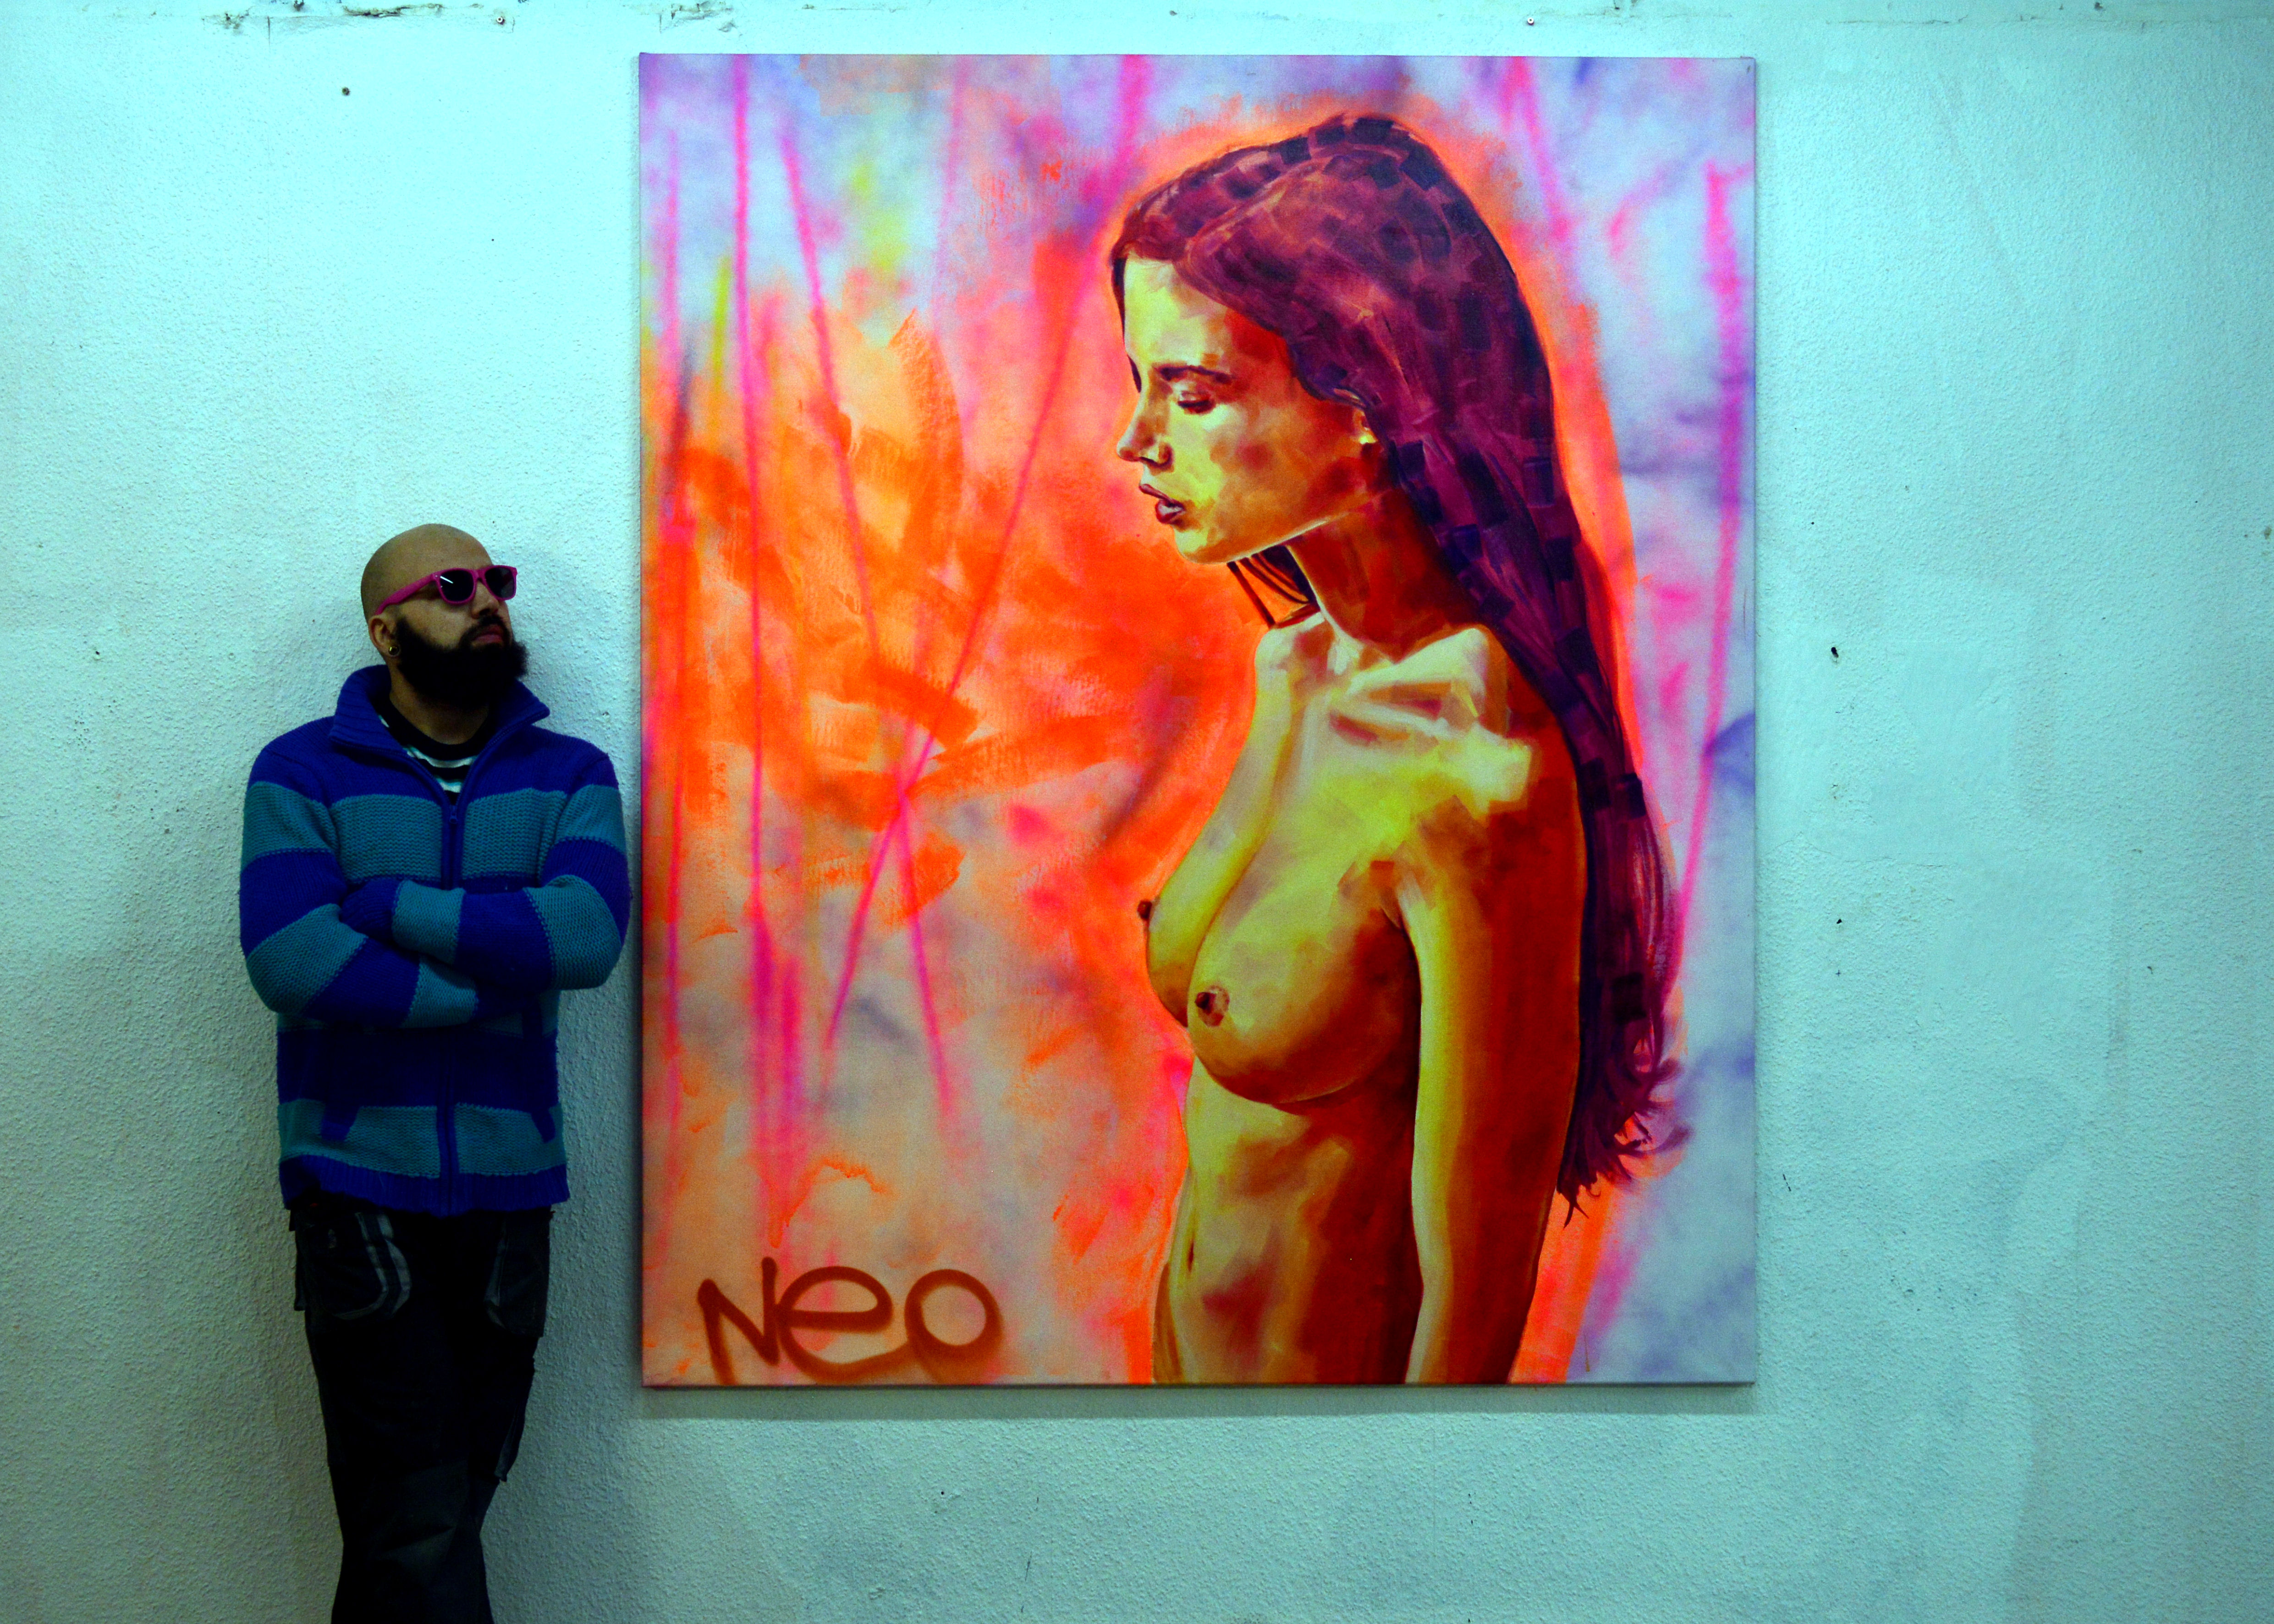 Francesco NEO_Eterna lSunshine_185x155_2016_A3.jpg